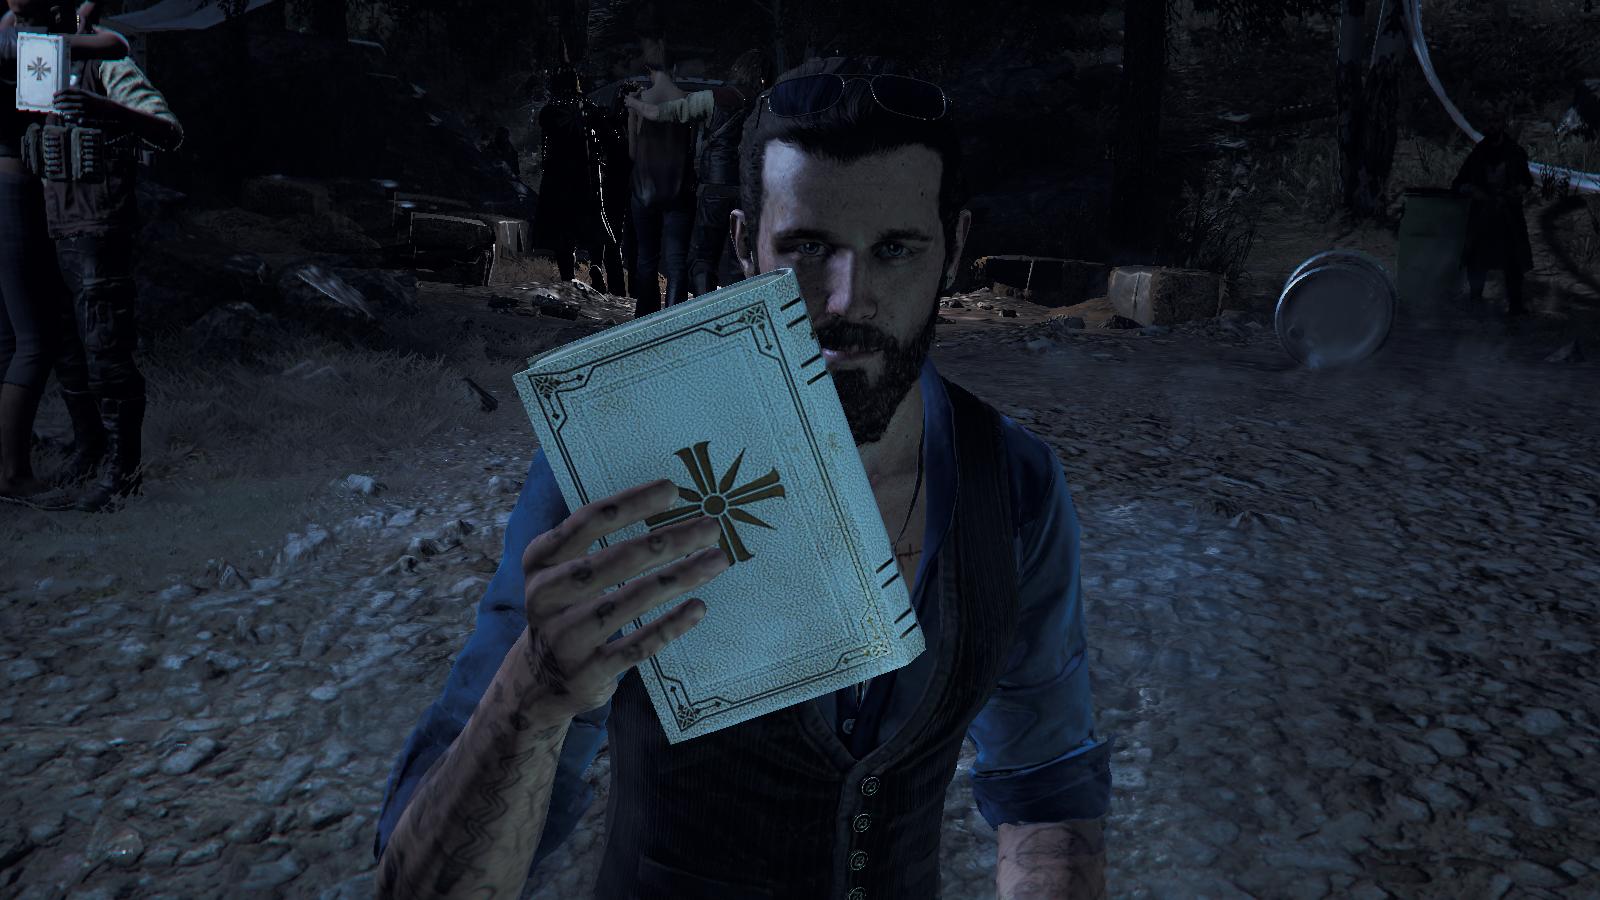 Far Cry 5 Screenshot 2018.04.27 - 00.37.33.19.png - -